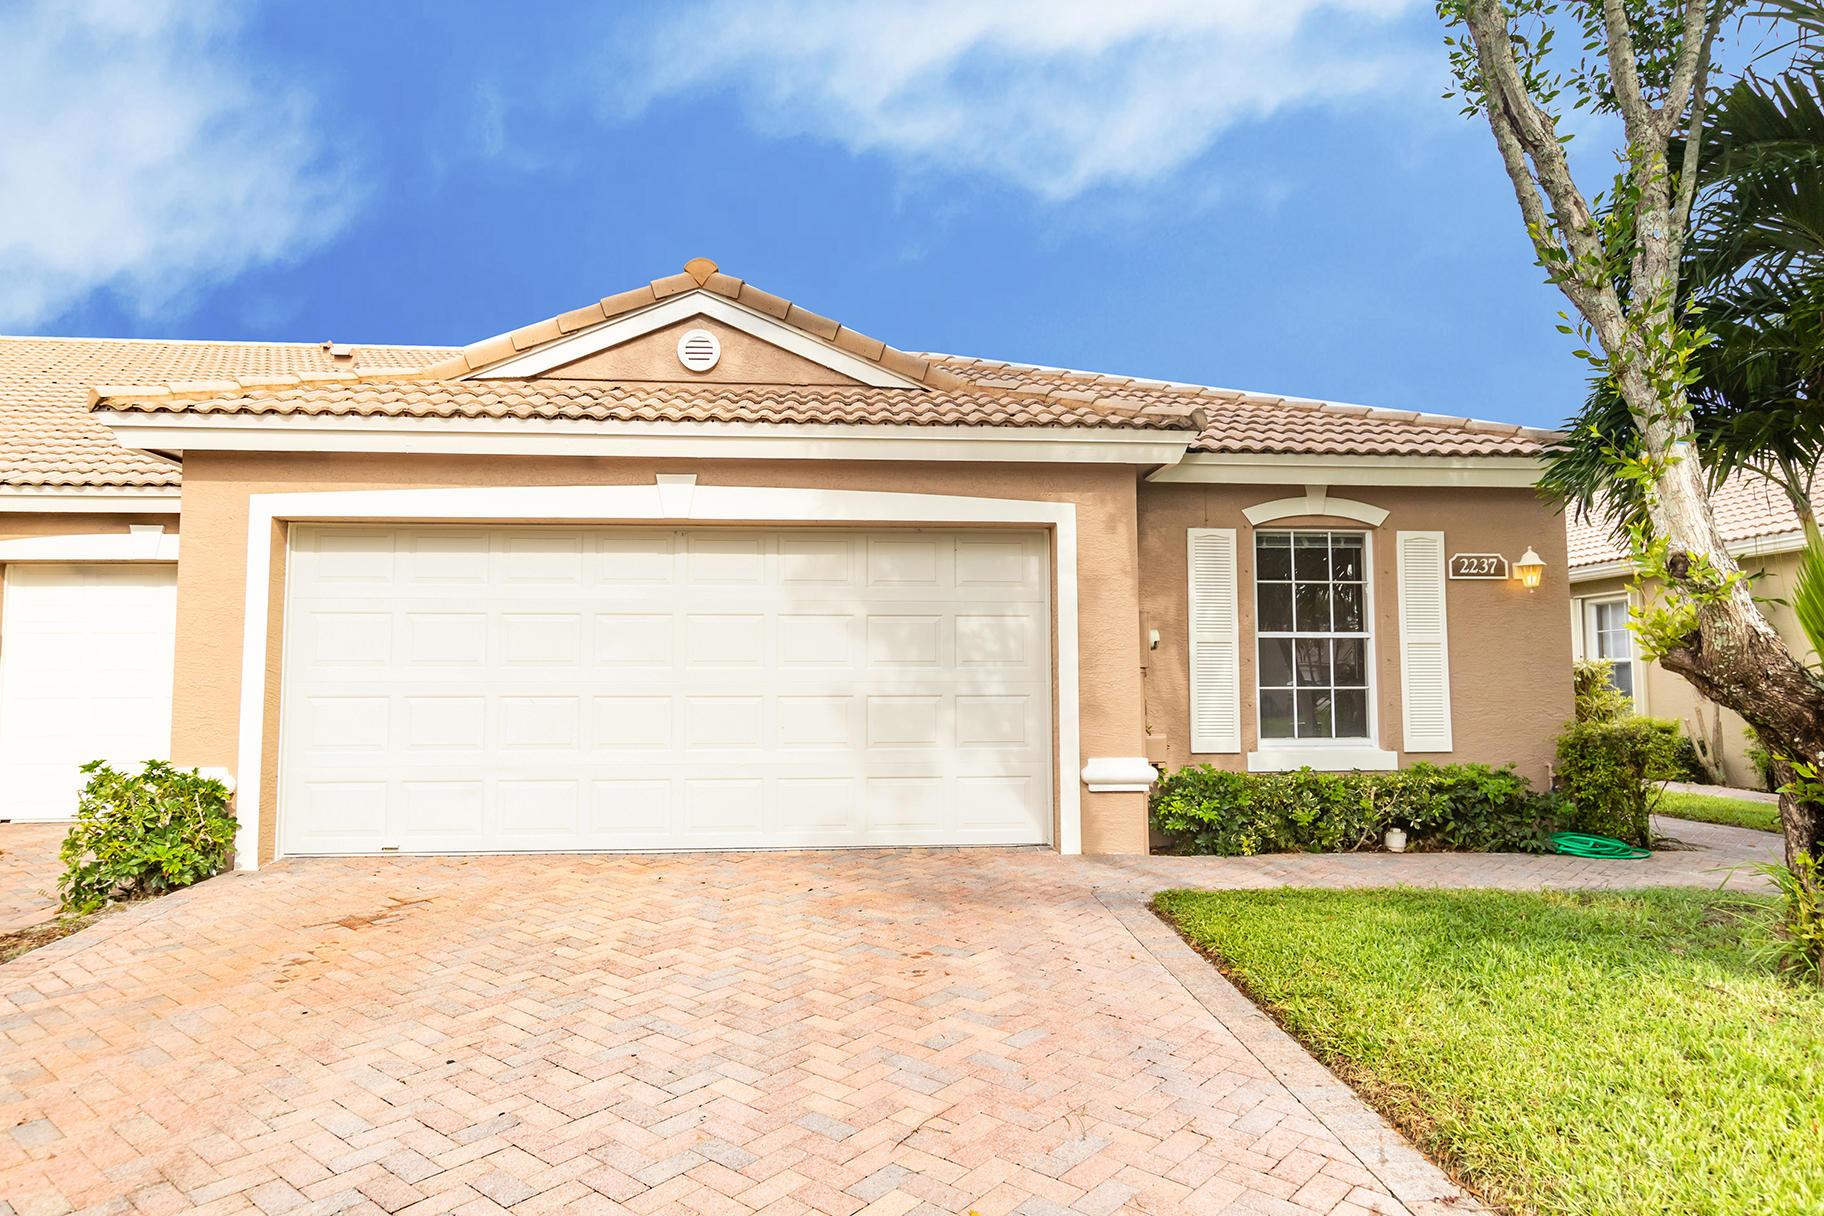 2237 Chickcharnies West Palm Beach, FL 33411